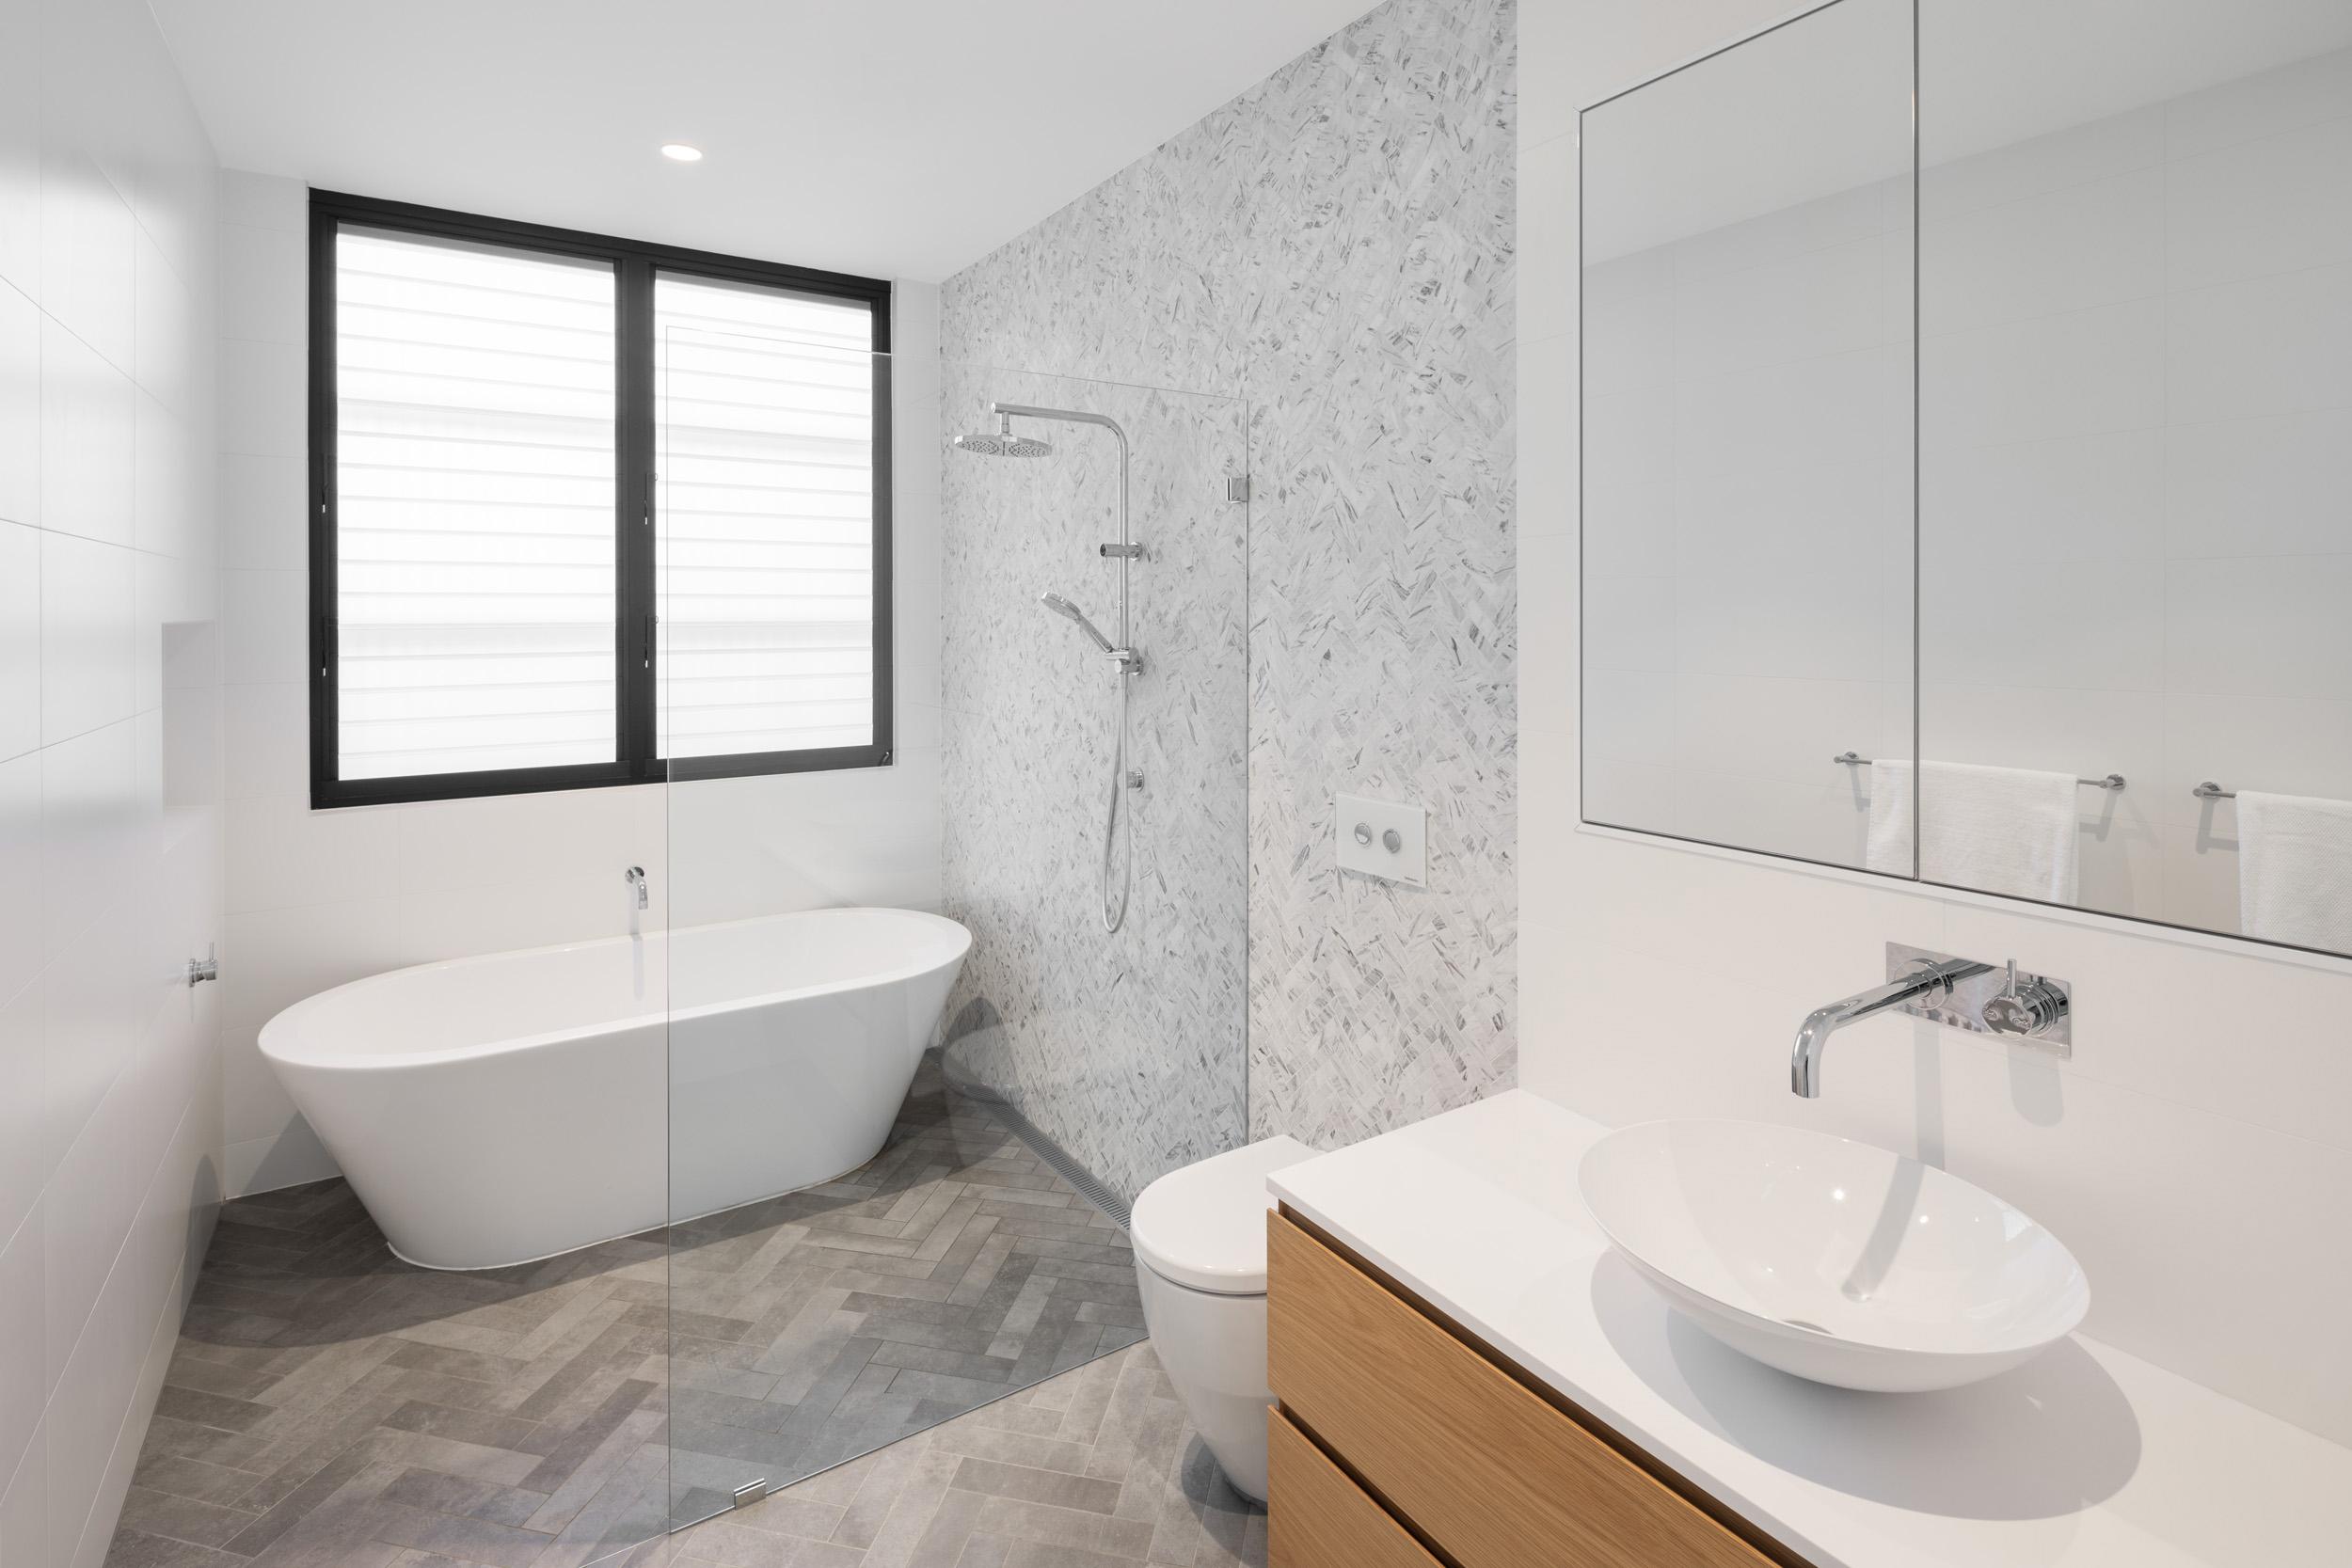 Jem_Cresswell_Architecture_Residential_Photographer_Sydney_Australia_025.jpg